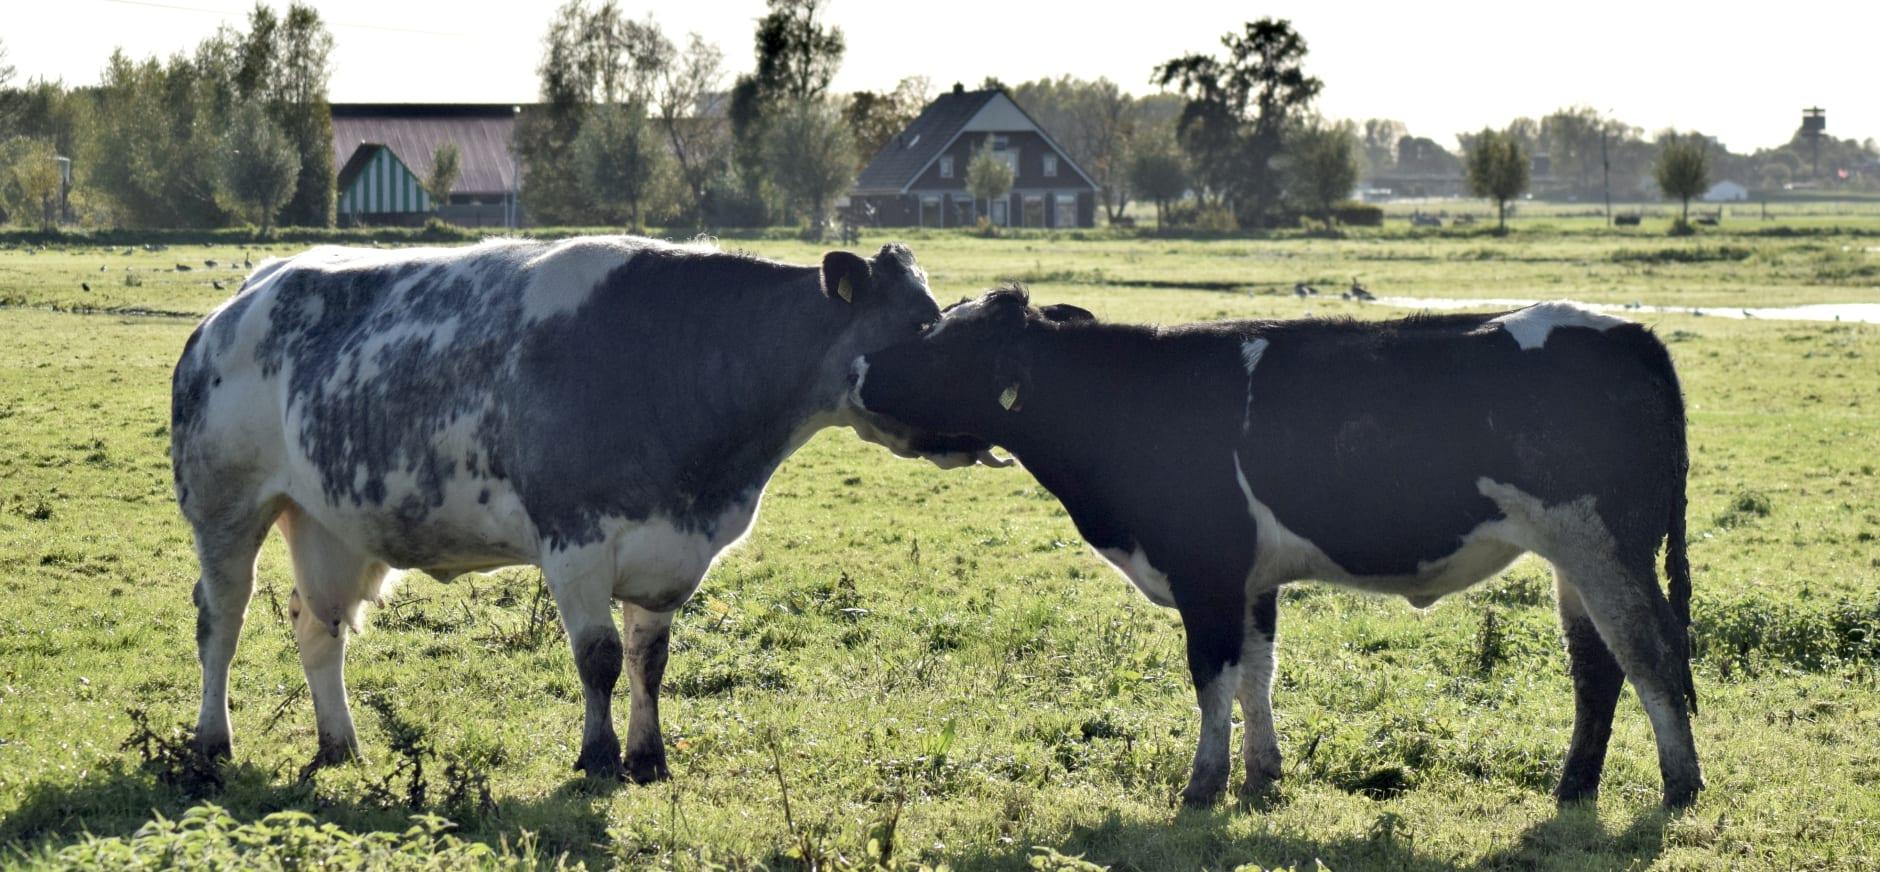 Hollandse koeien liefde